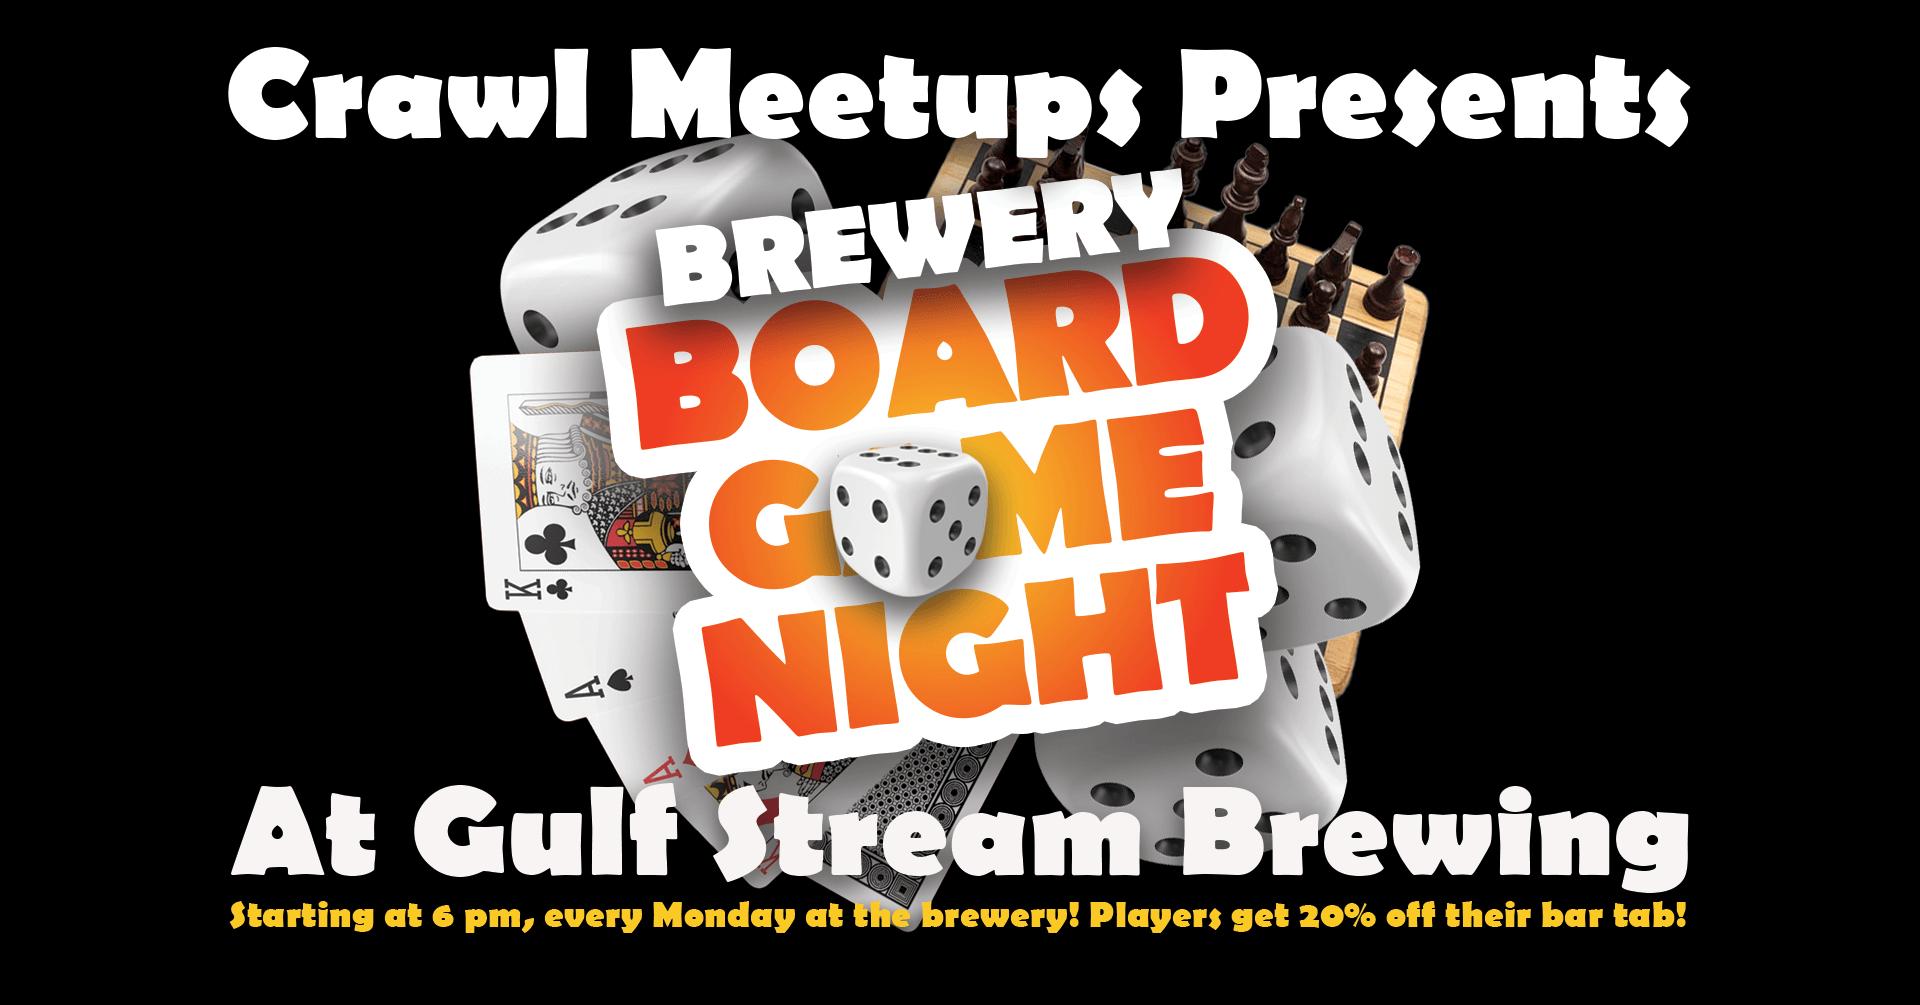 Board Game Night every Monday at Gulf Stream Brewing Company!